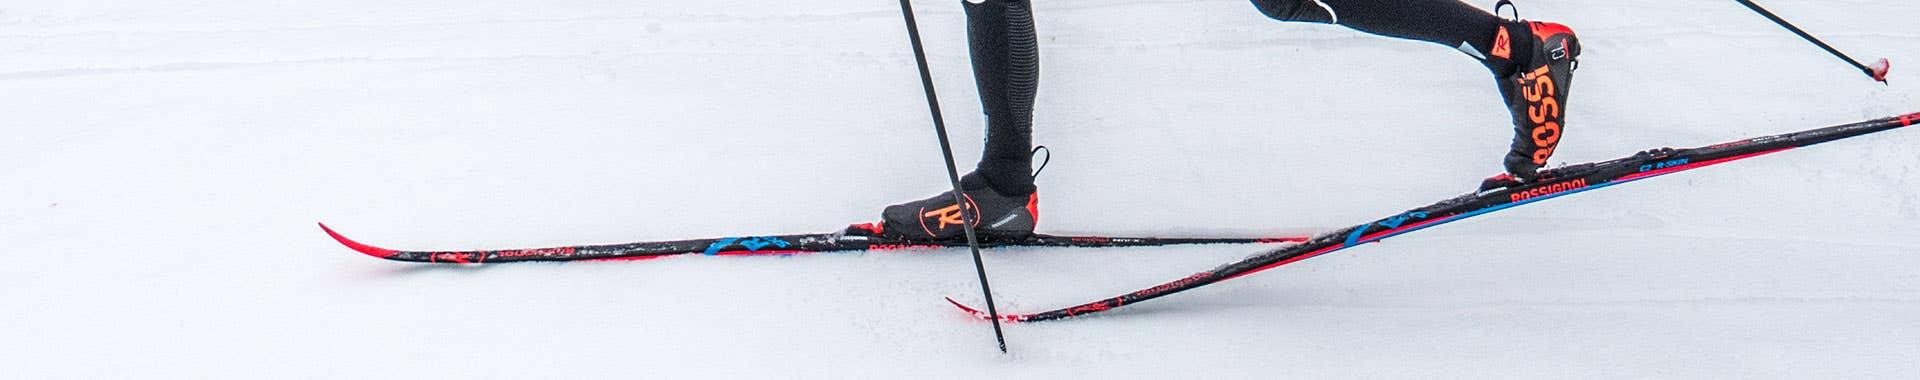 Classic ski boots